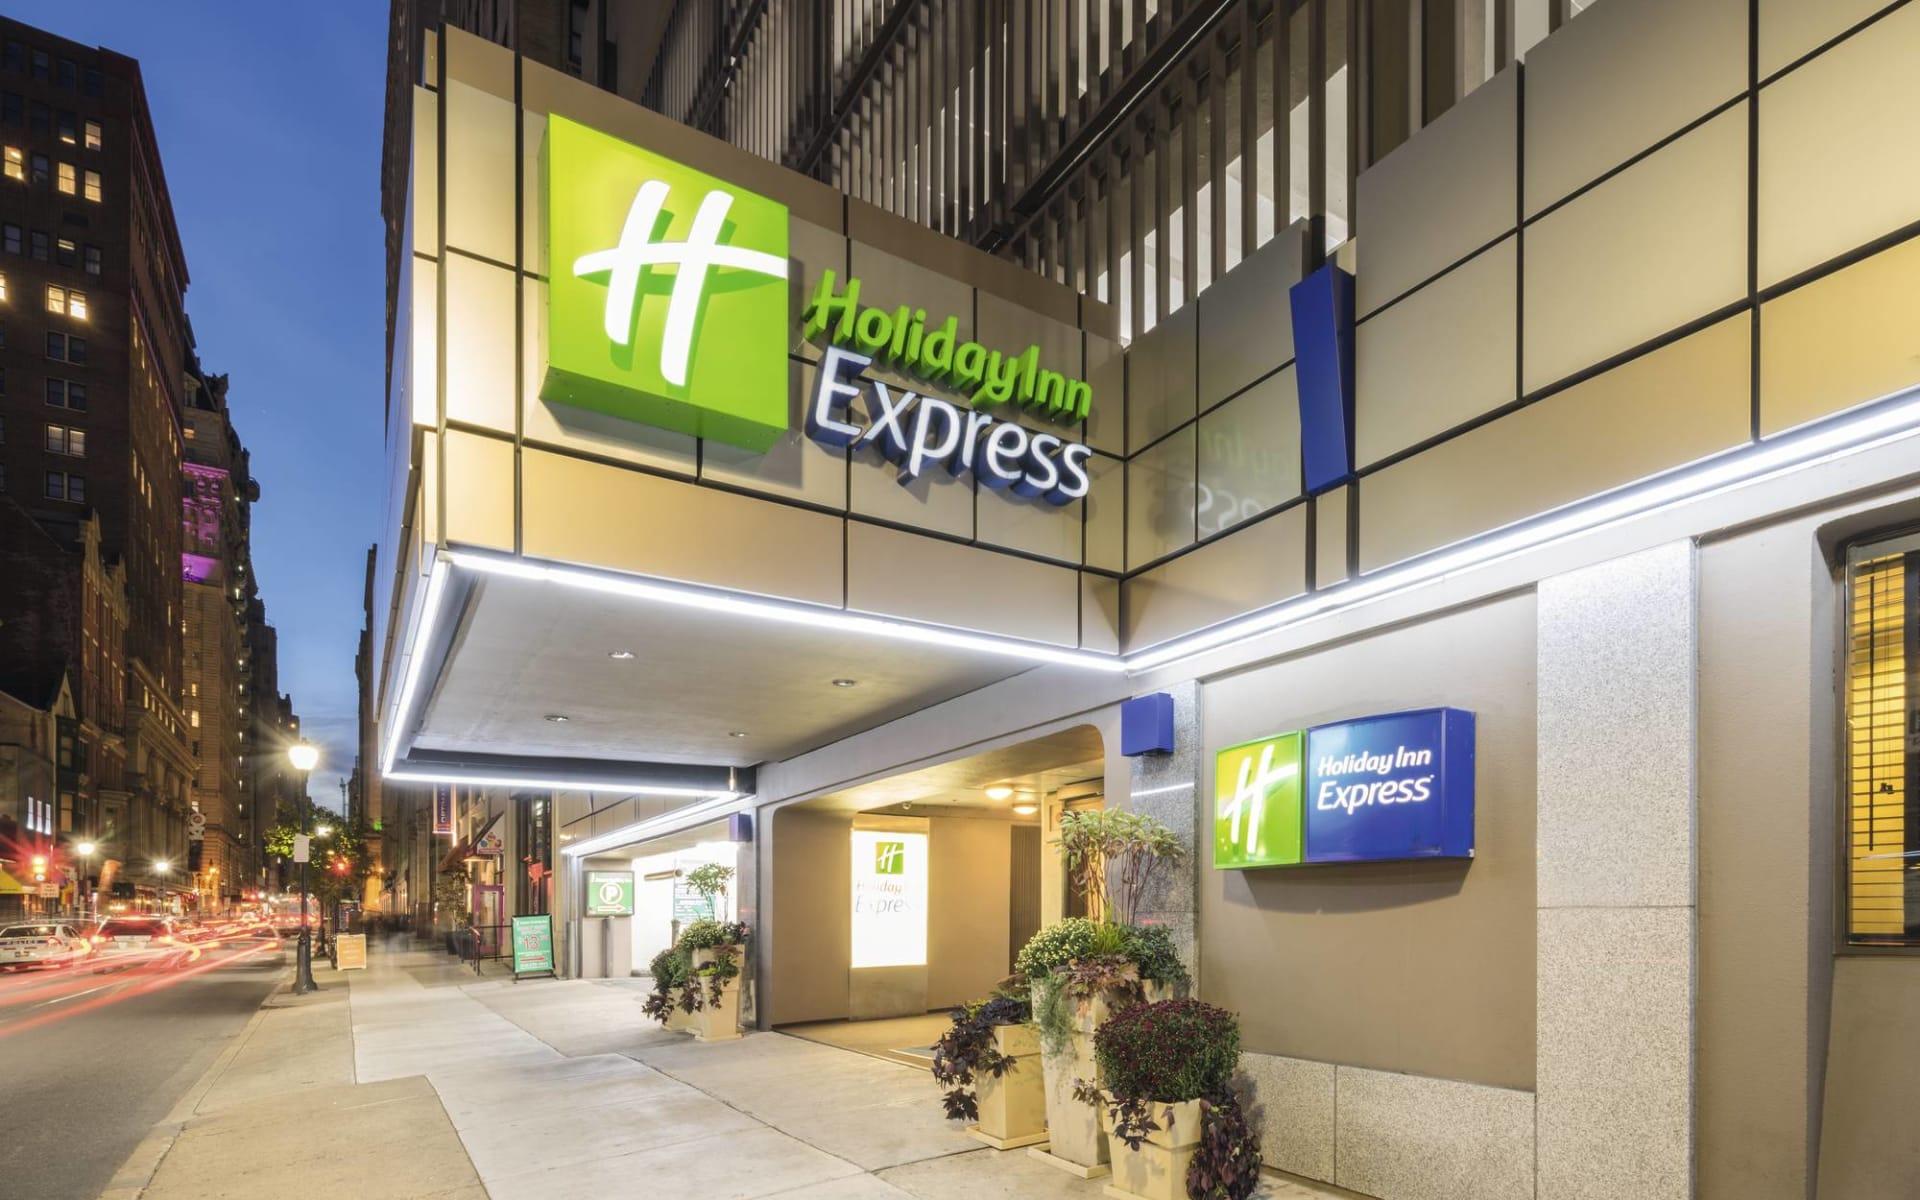 Holiday Inn Express Midtown in Philadelphia: Exterior_Holiday Inn Express Midtown PHL_Aussenansicht bei Nacht_ATI